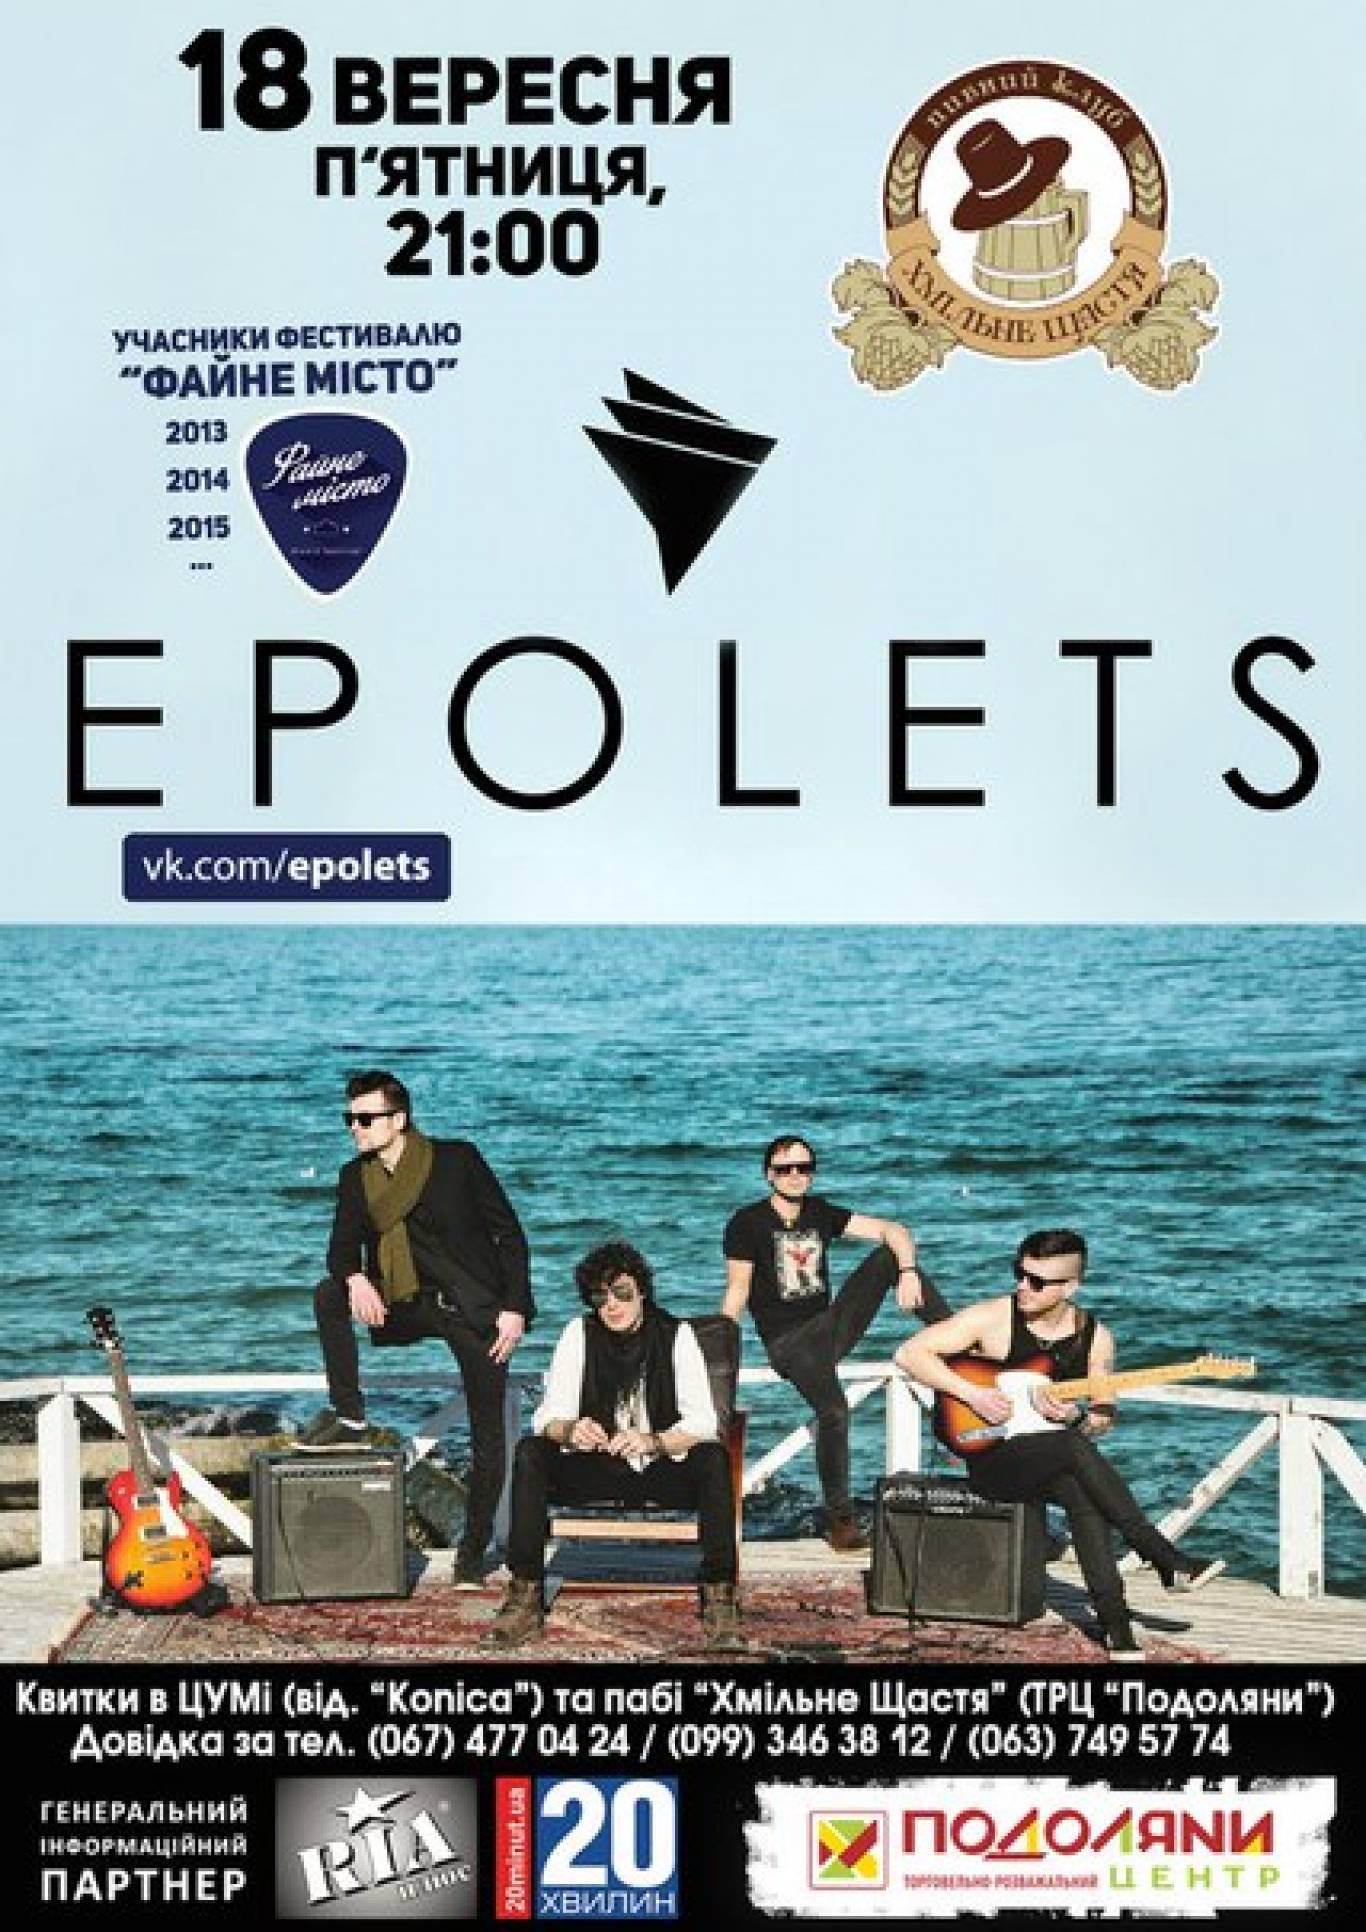 Концерт Epolets